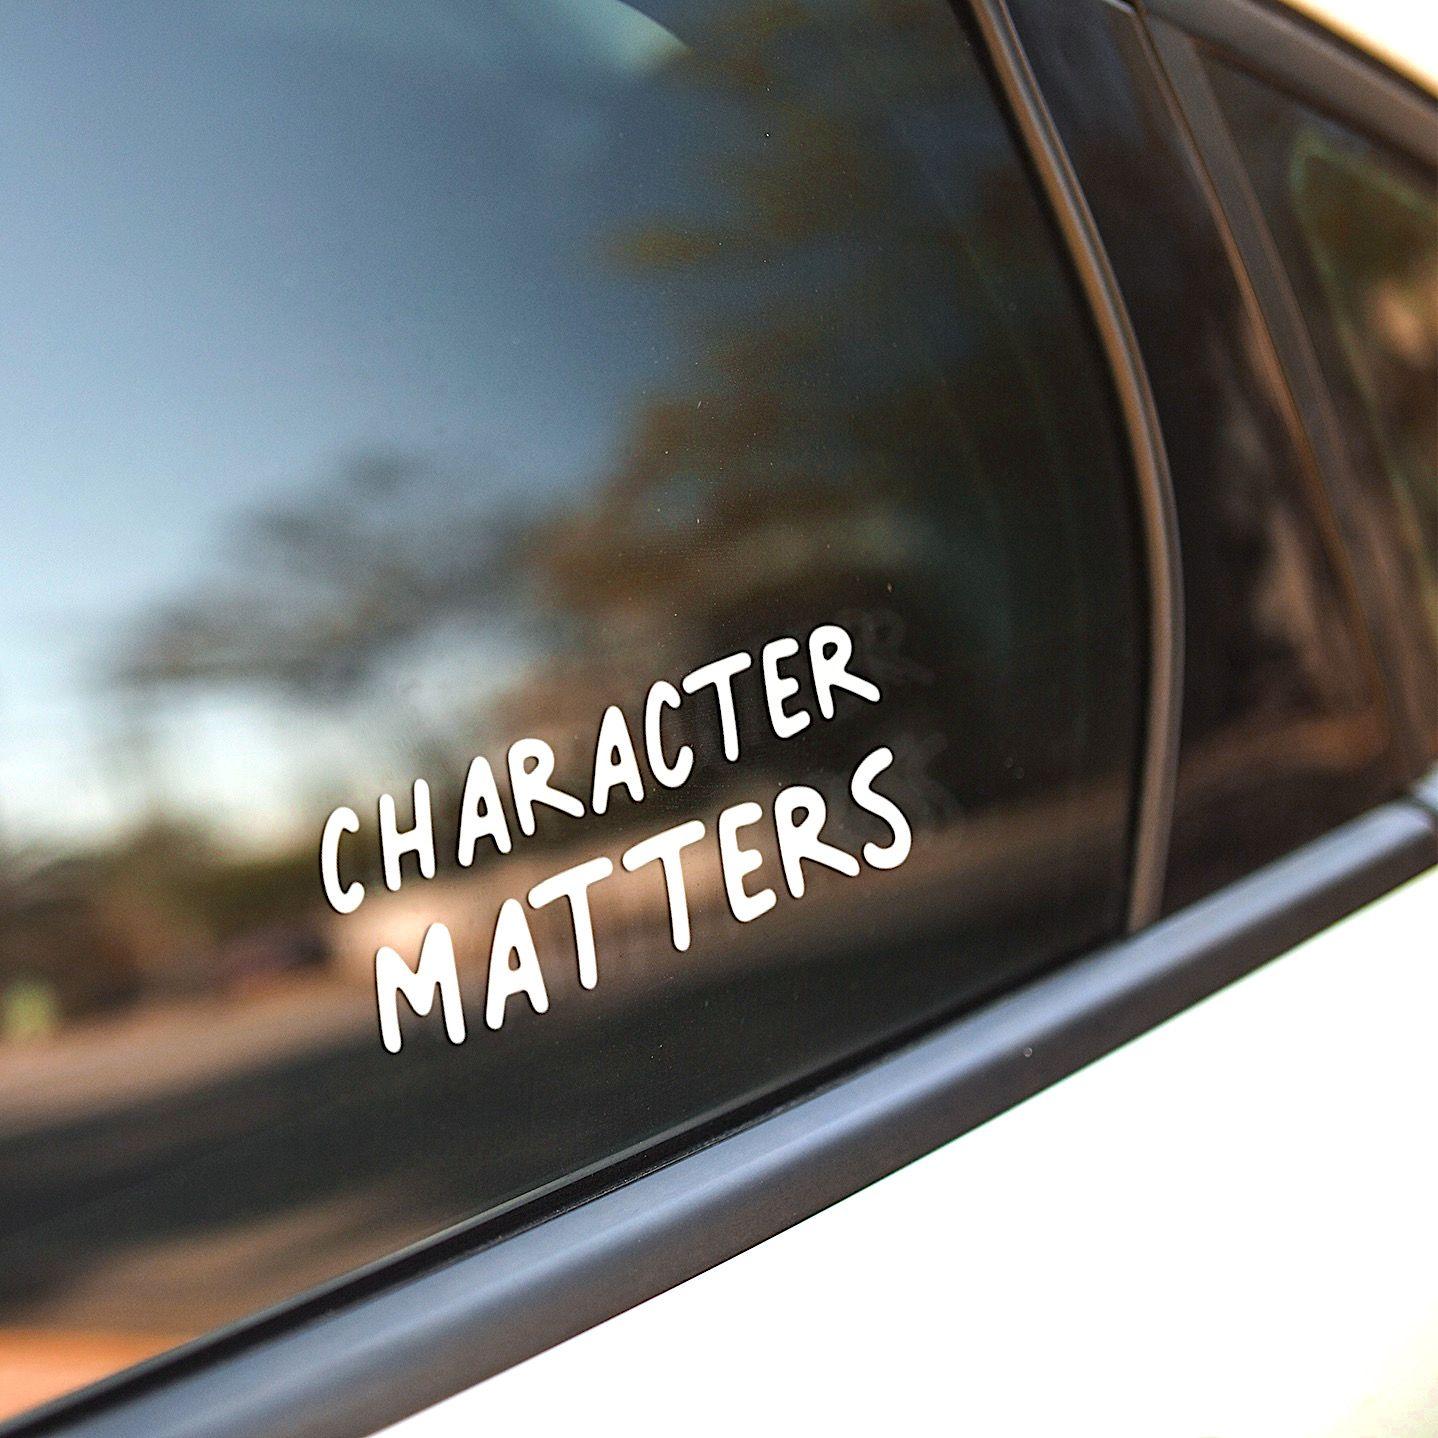 Car Decal Character Matters Vinyl Decal Glossy Decal White Vinyl Window Decal Car Decals Character Vinyl Decals [ 1438 x 1438 Pixel ]